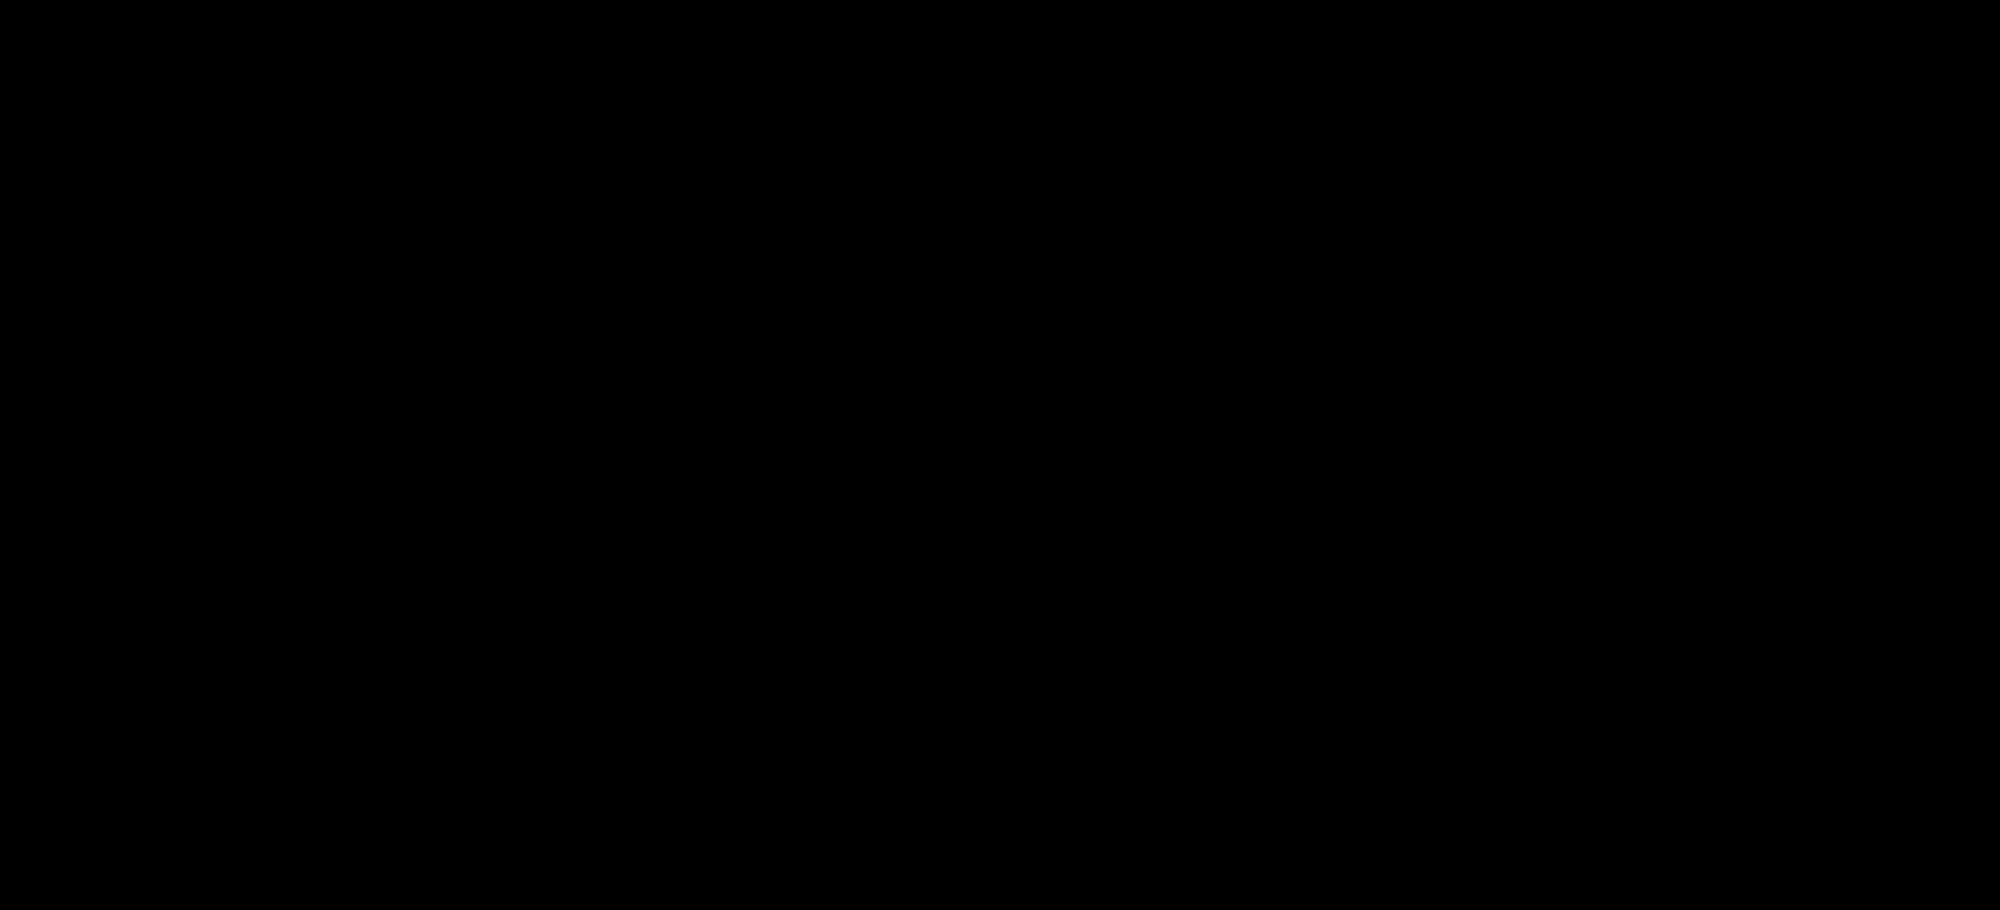 L - methionine |Structure & Functions | Food Sources ...  L - methionine ...